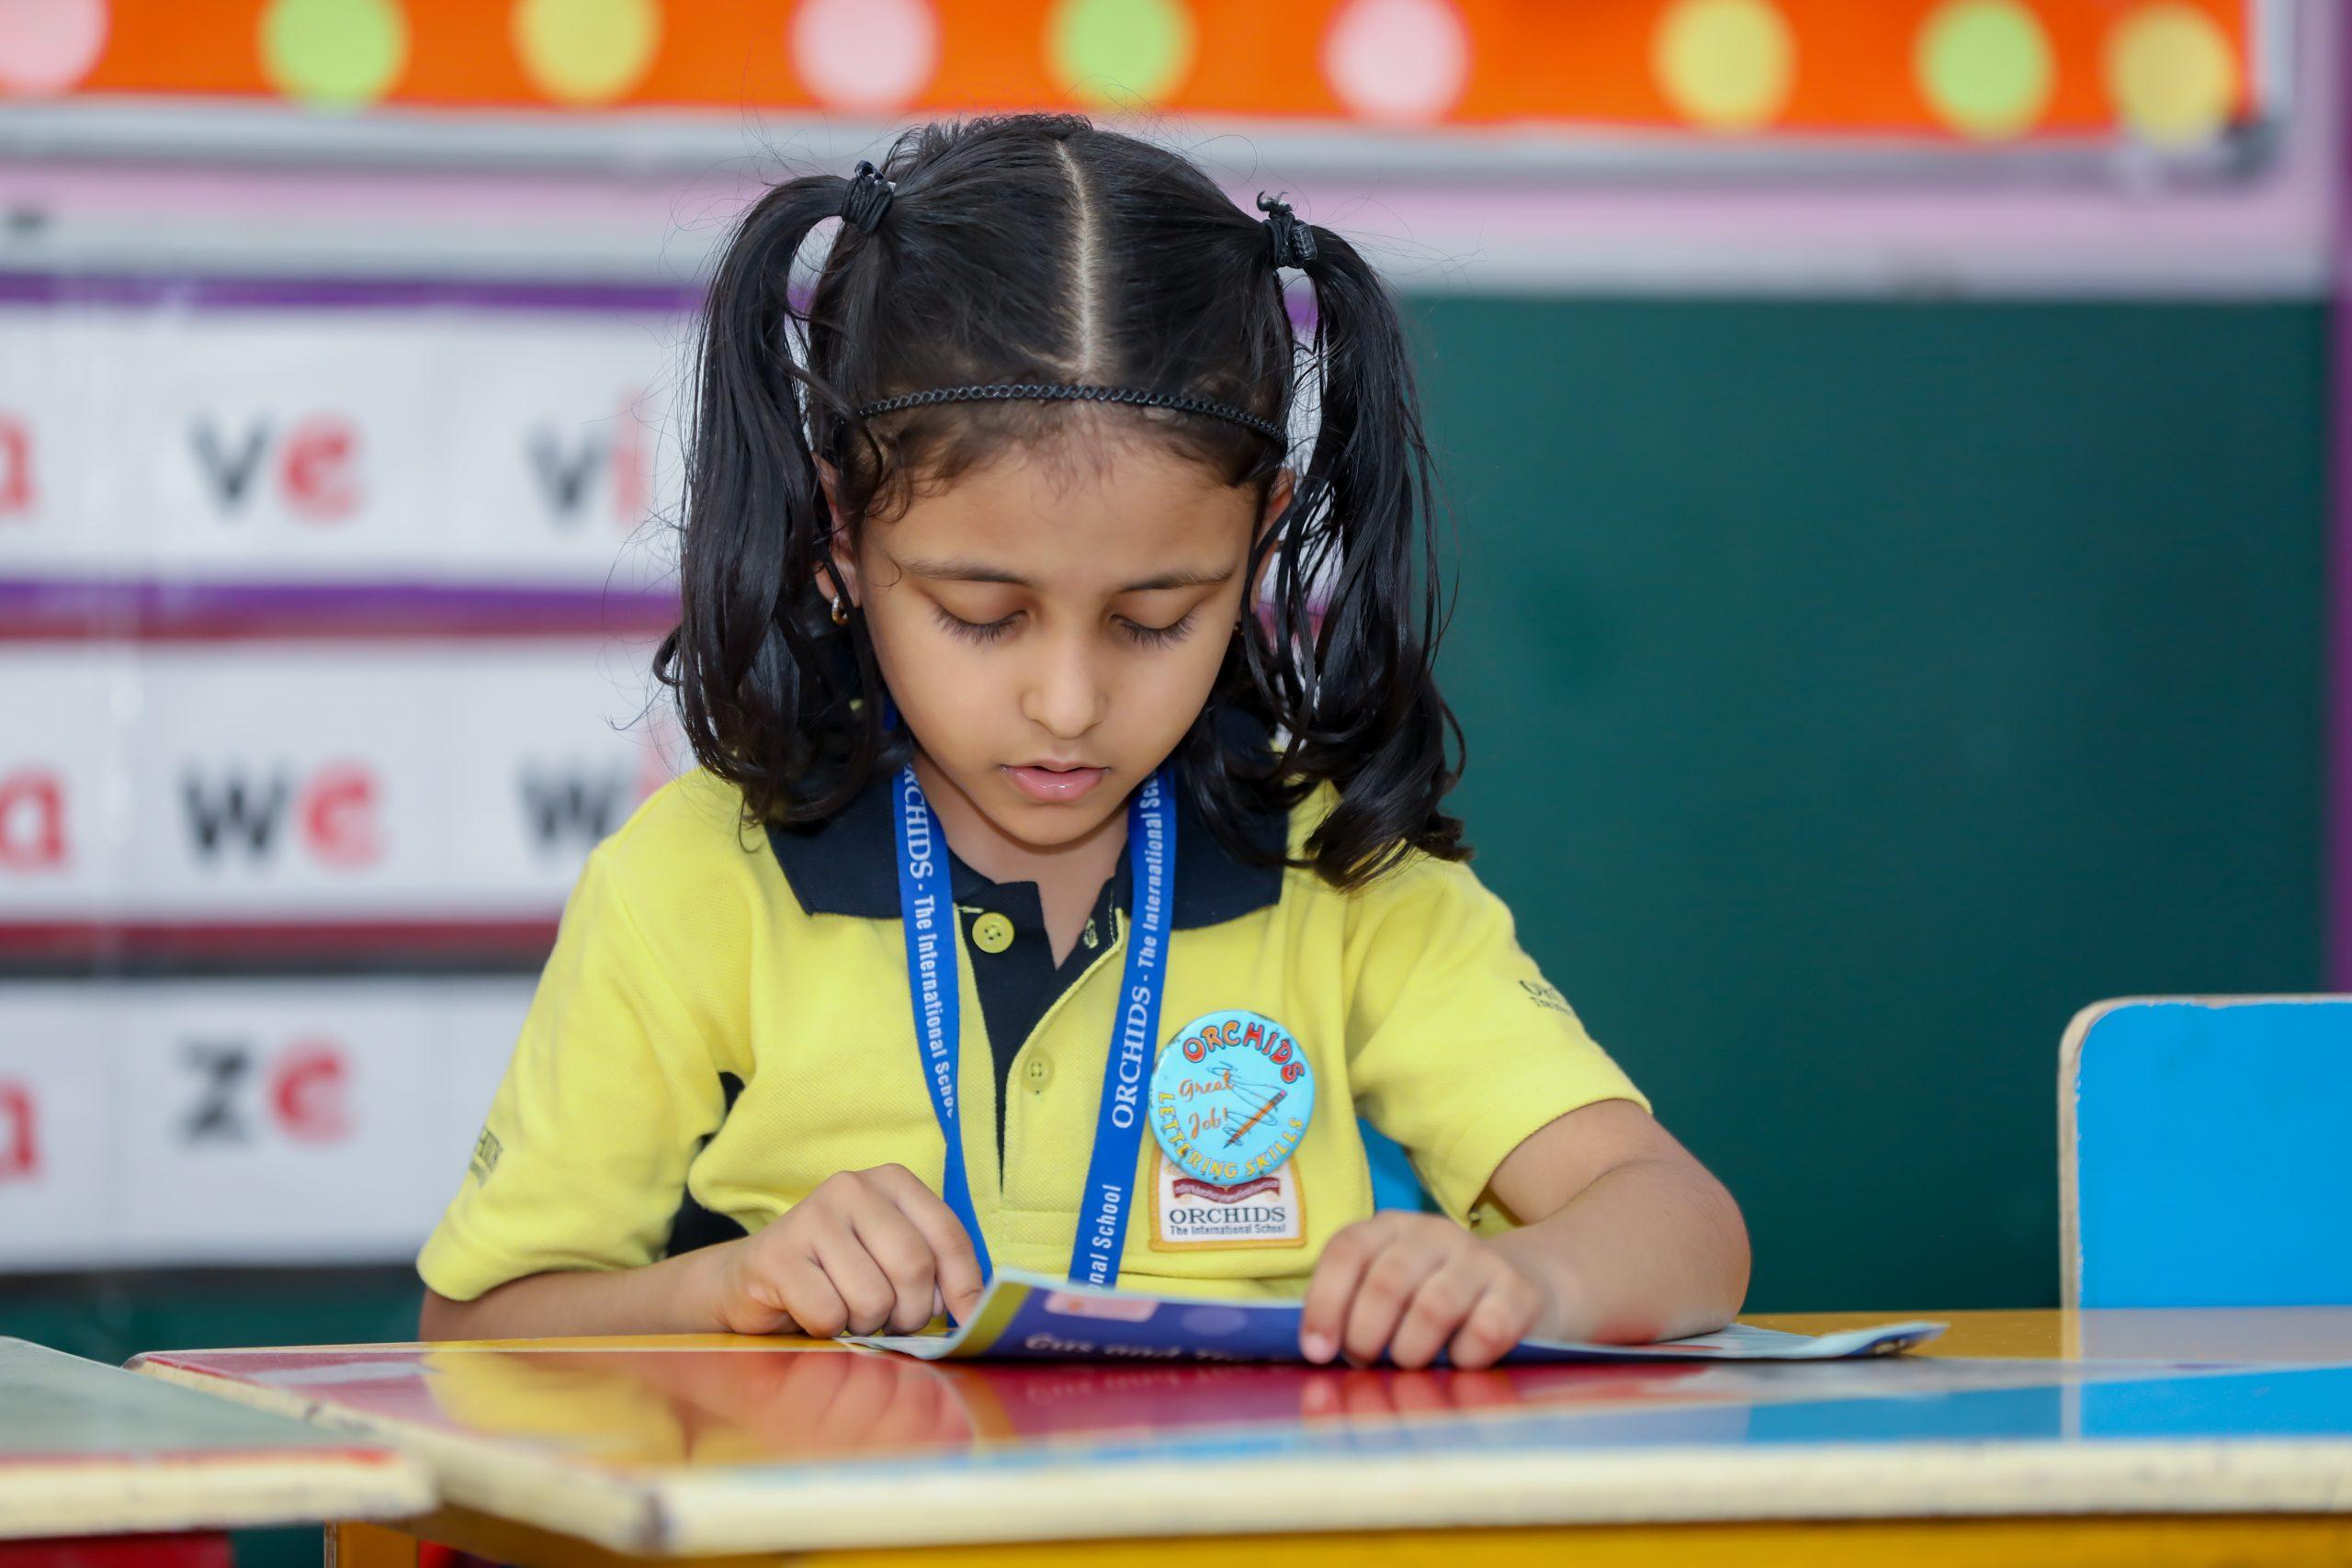 Orchids International School understands the importance of reading in children.